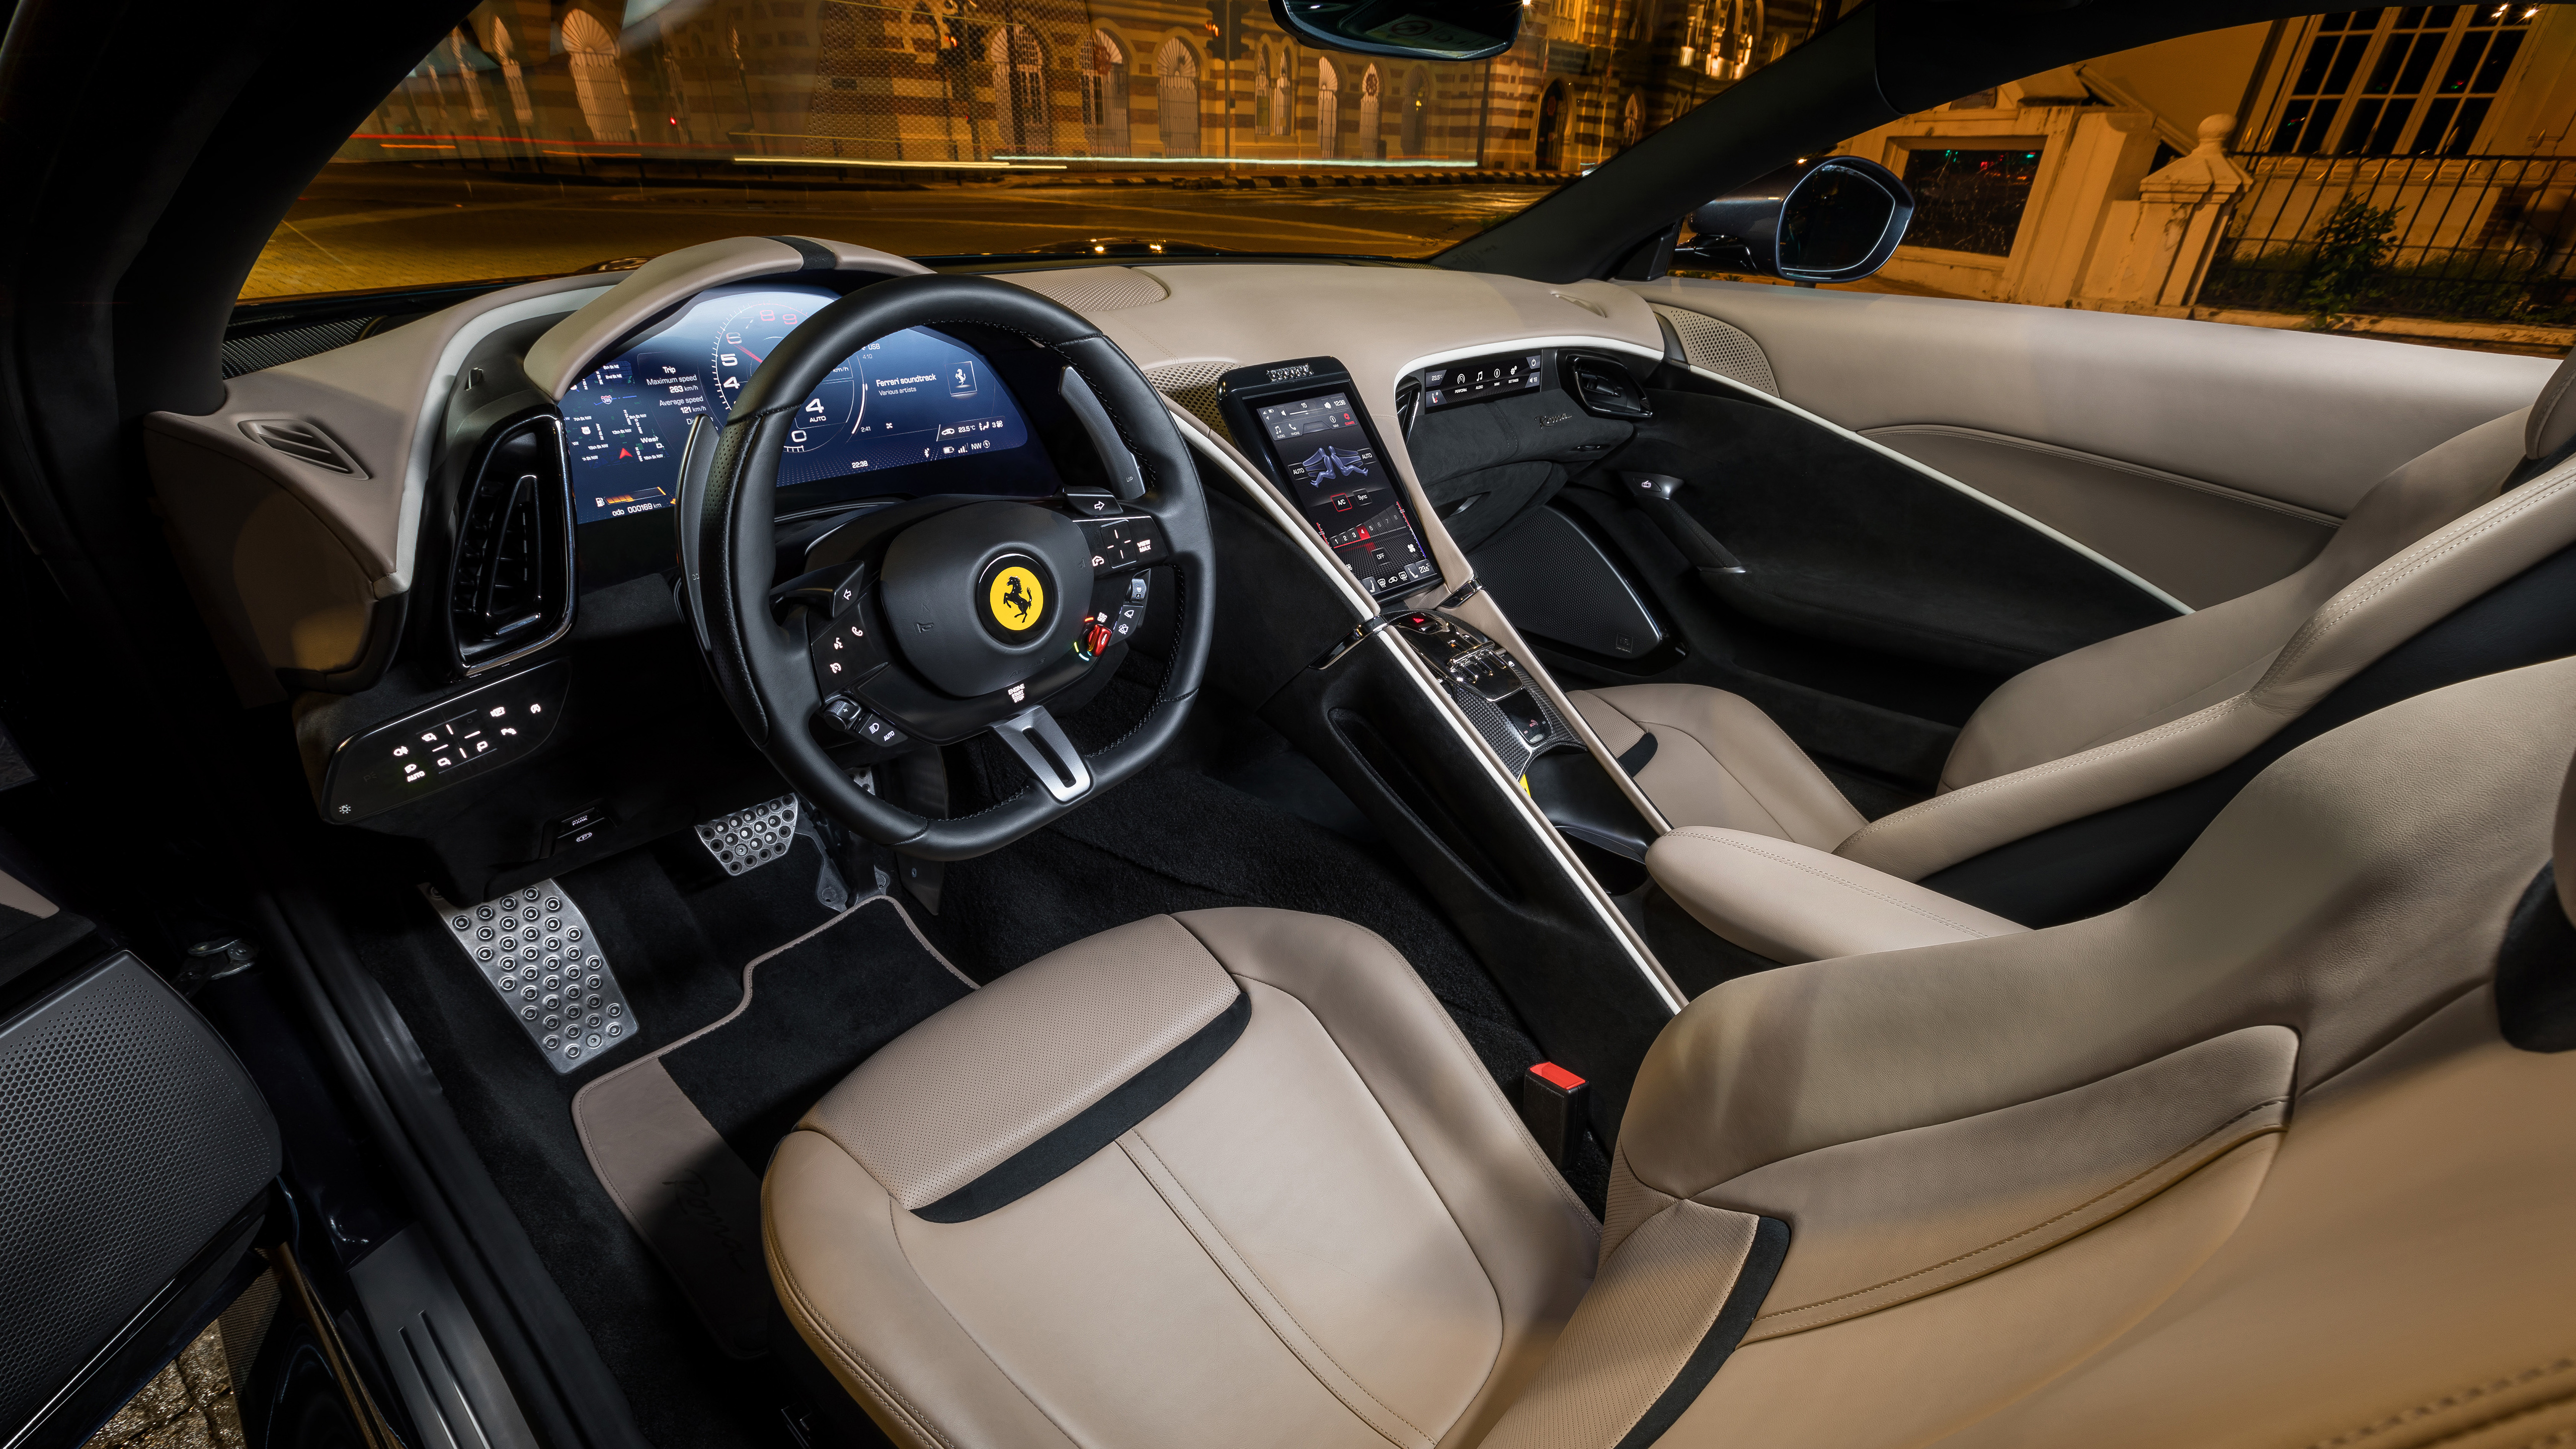 Ferrari Roma 2020 5k Interior Wallpaper Hd Car Wallpapers Id 15142